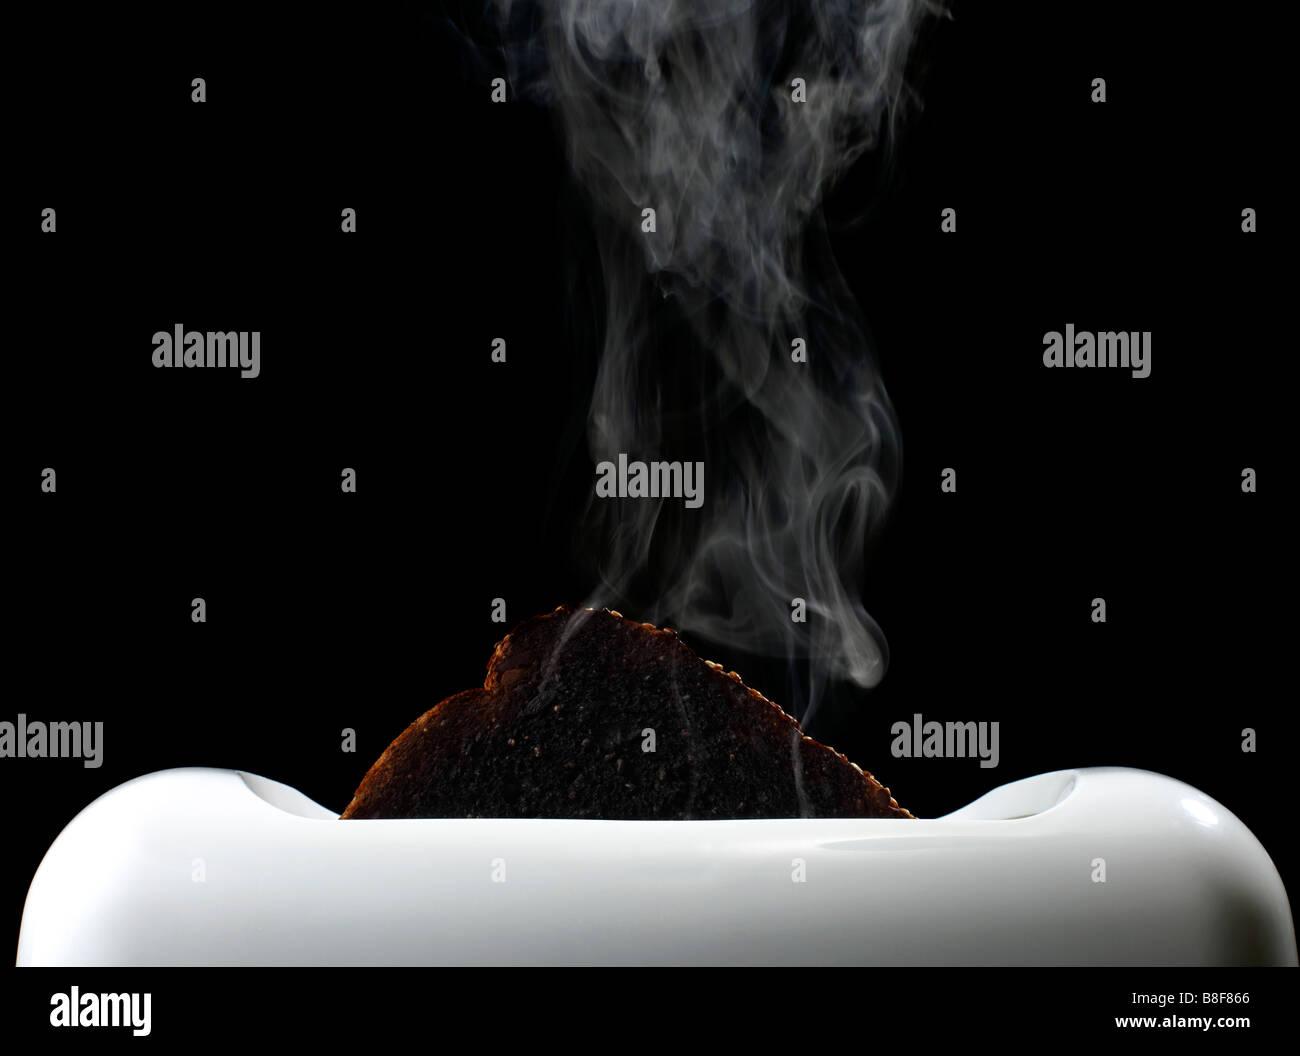 Smoking Burnt Toast in Toaster - Stock Image